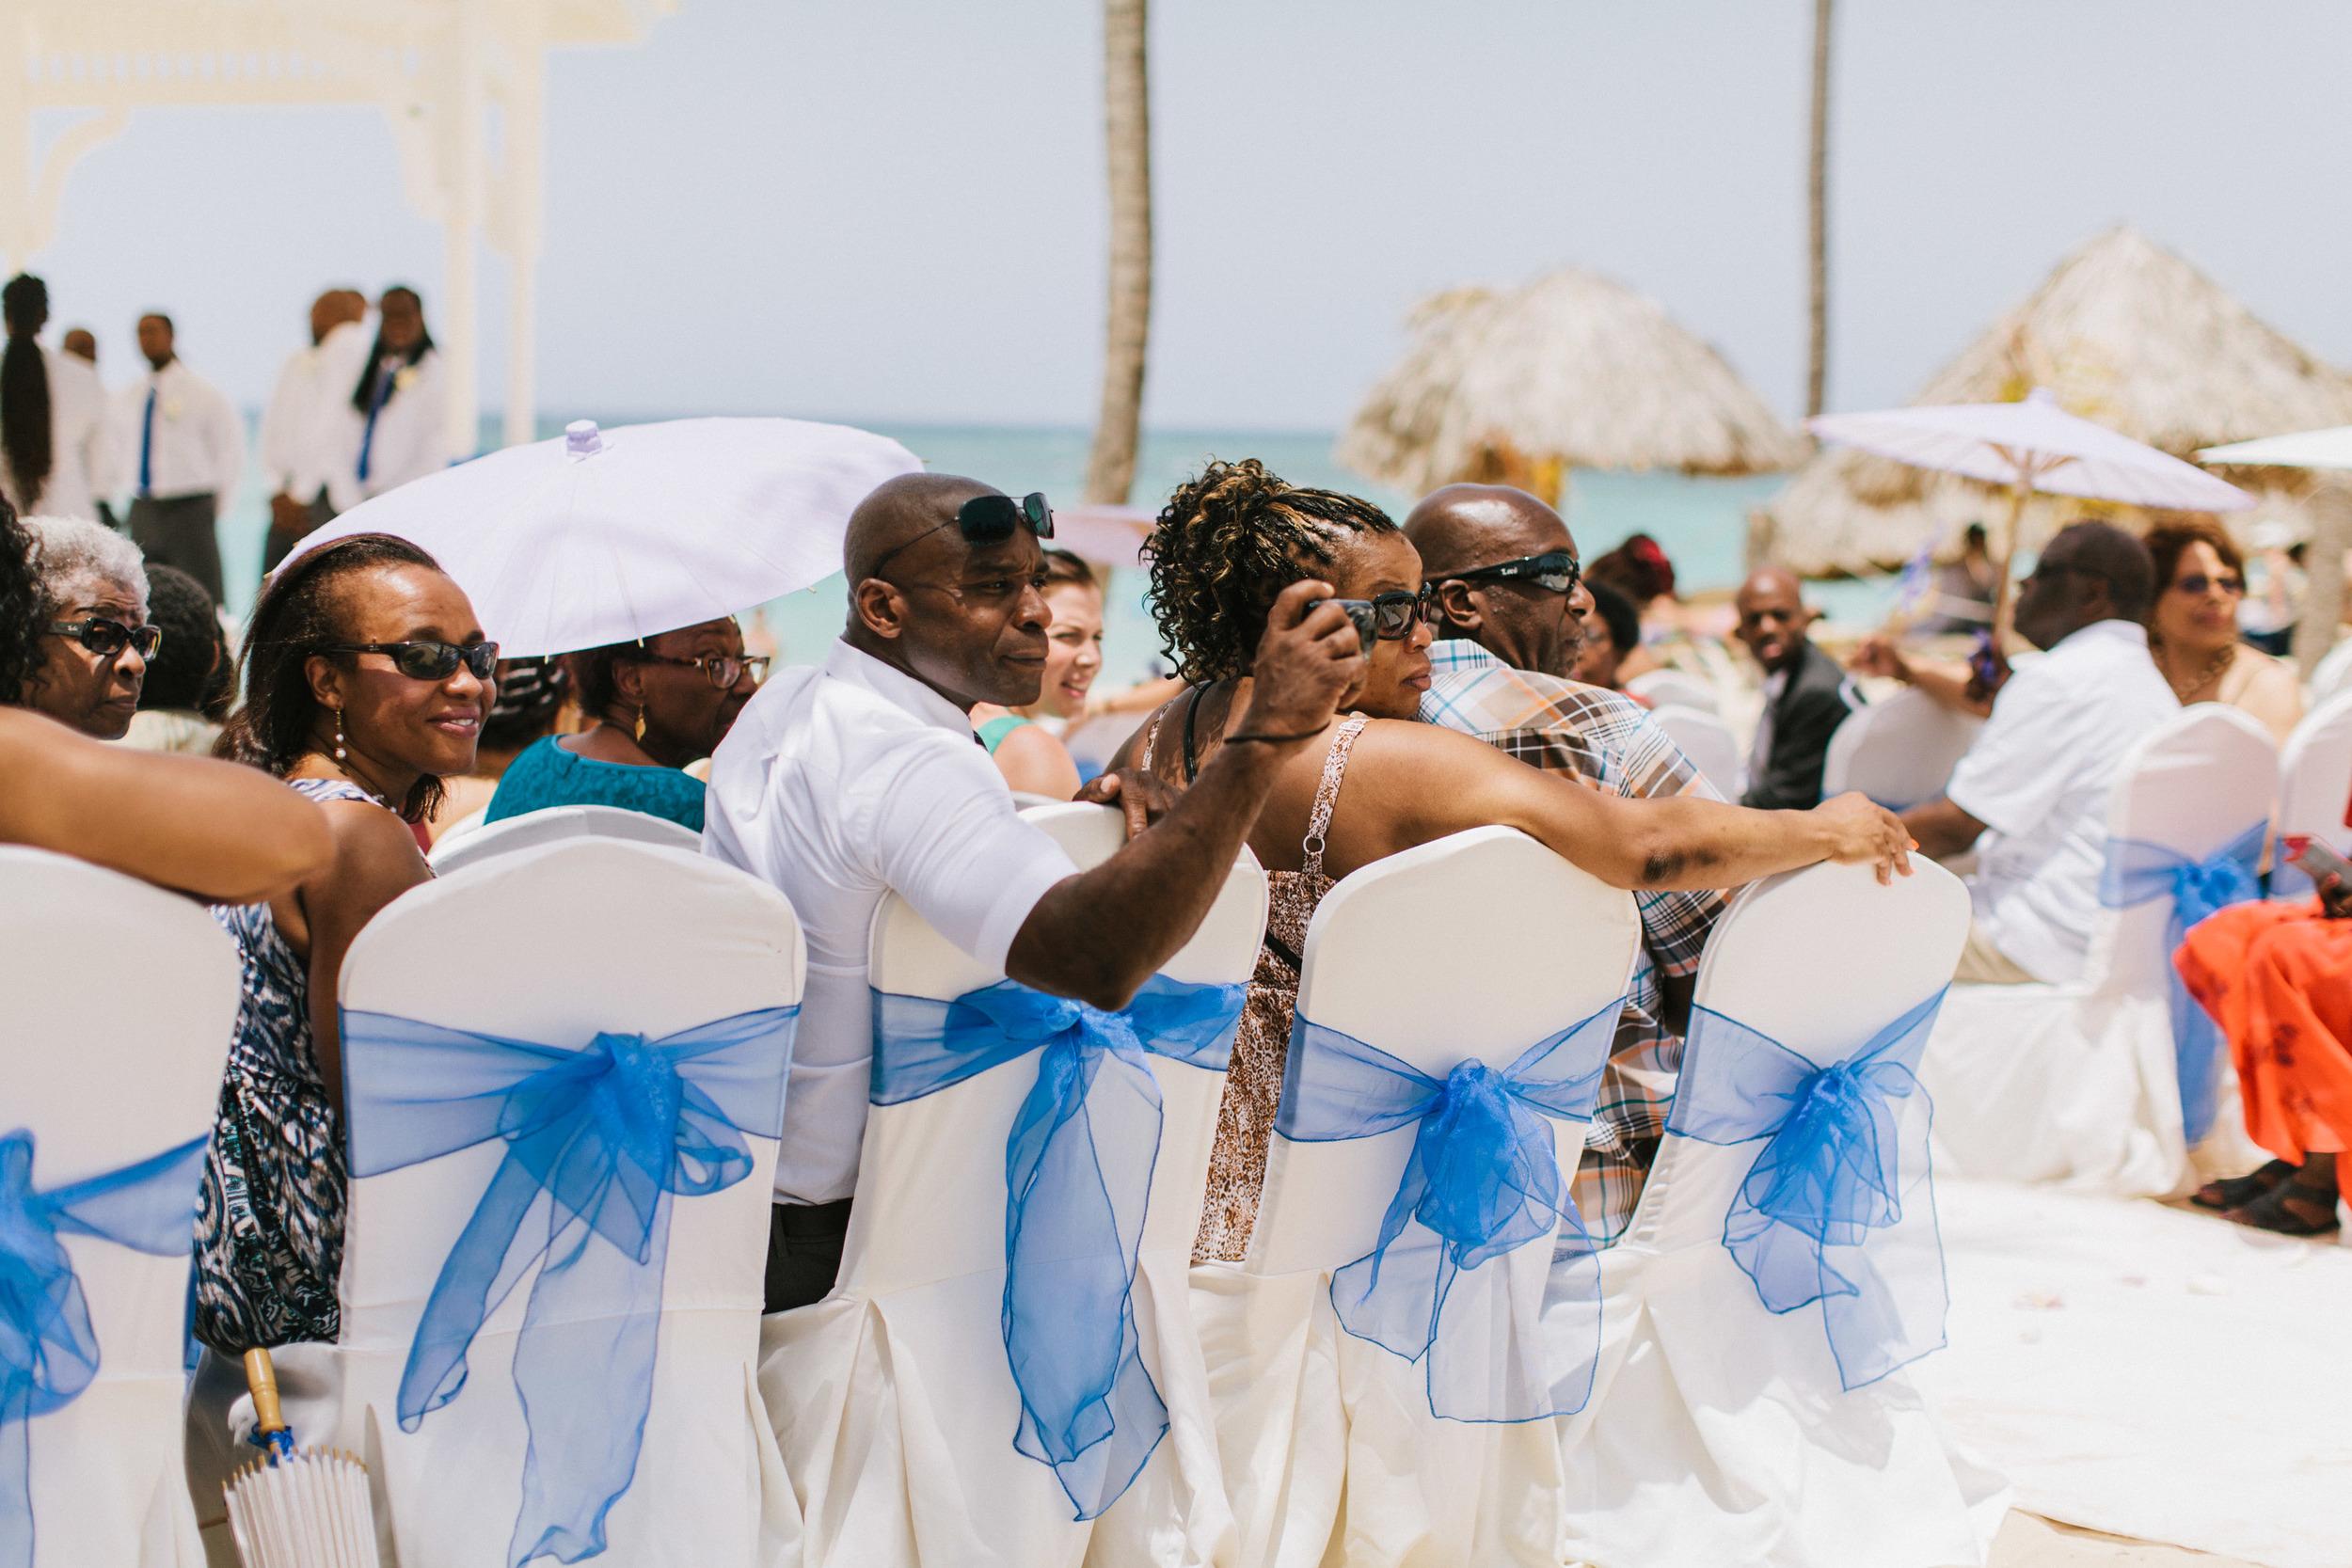 michael-rousseau-photography-dominican-republic-destination-wedding-cara-jason-colonial-majestic-dominican-republic066.jpg